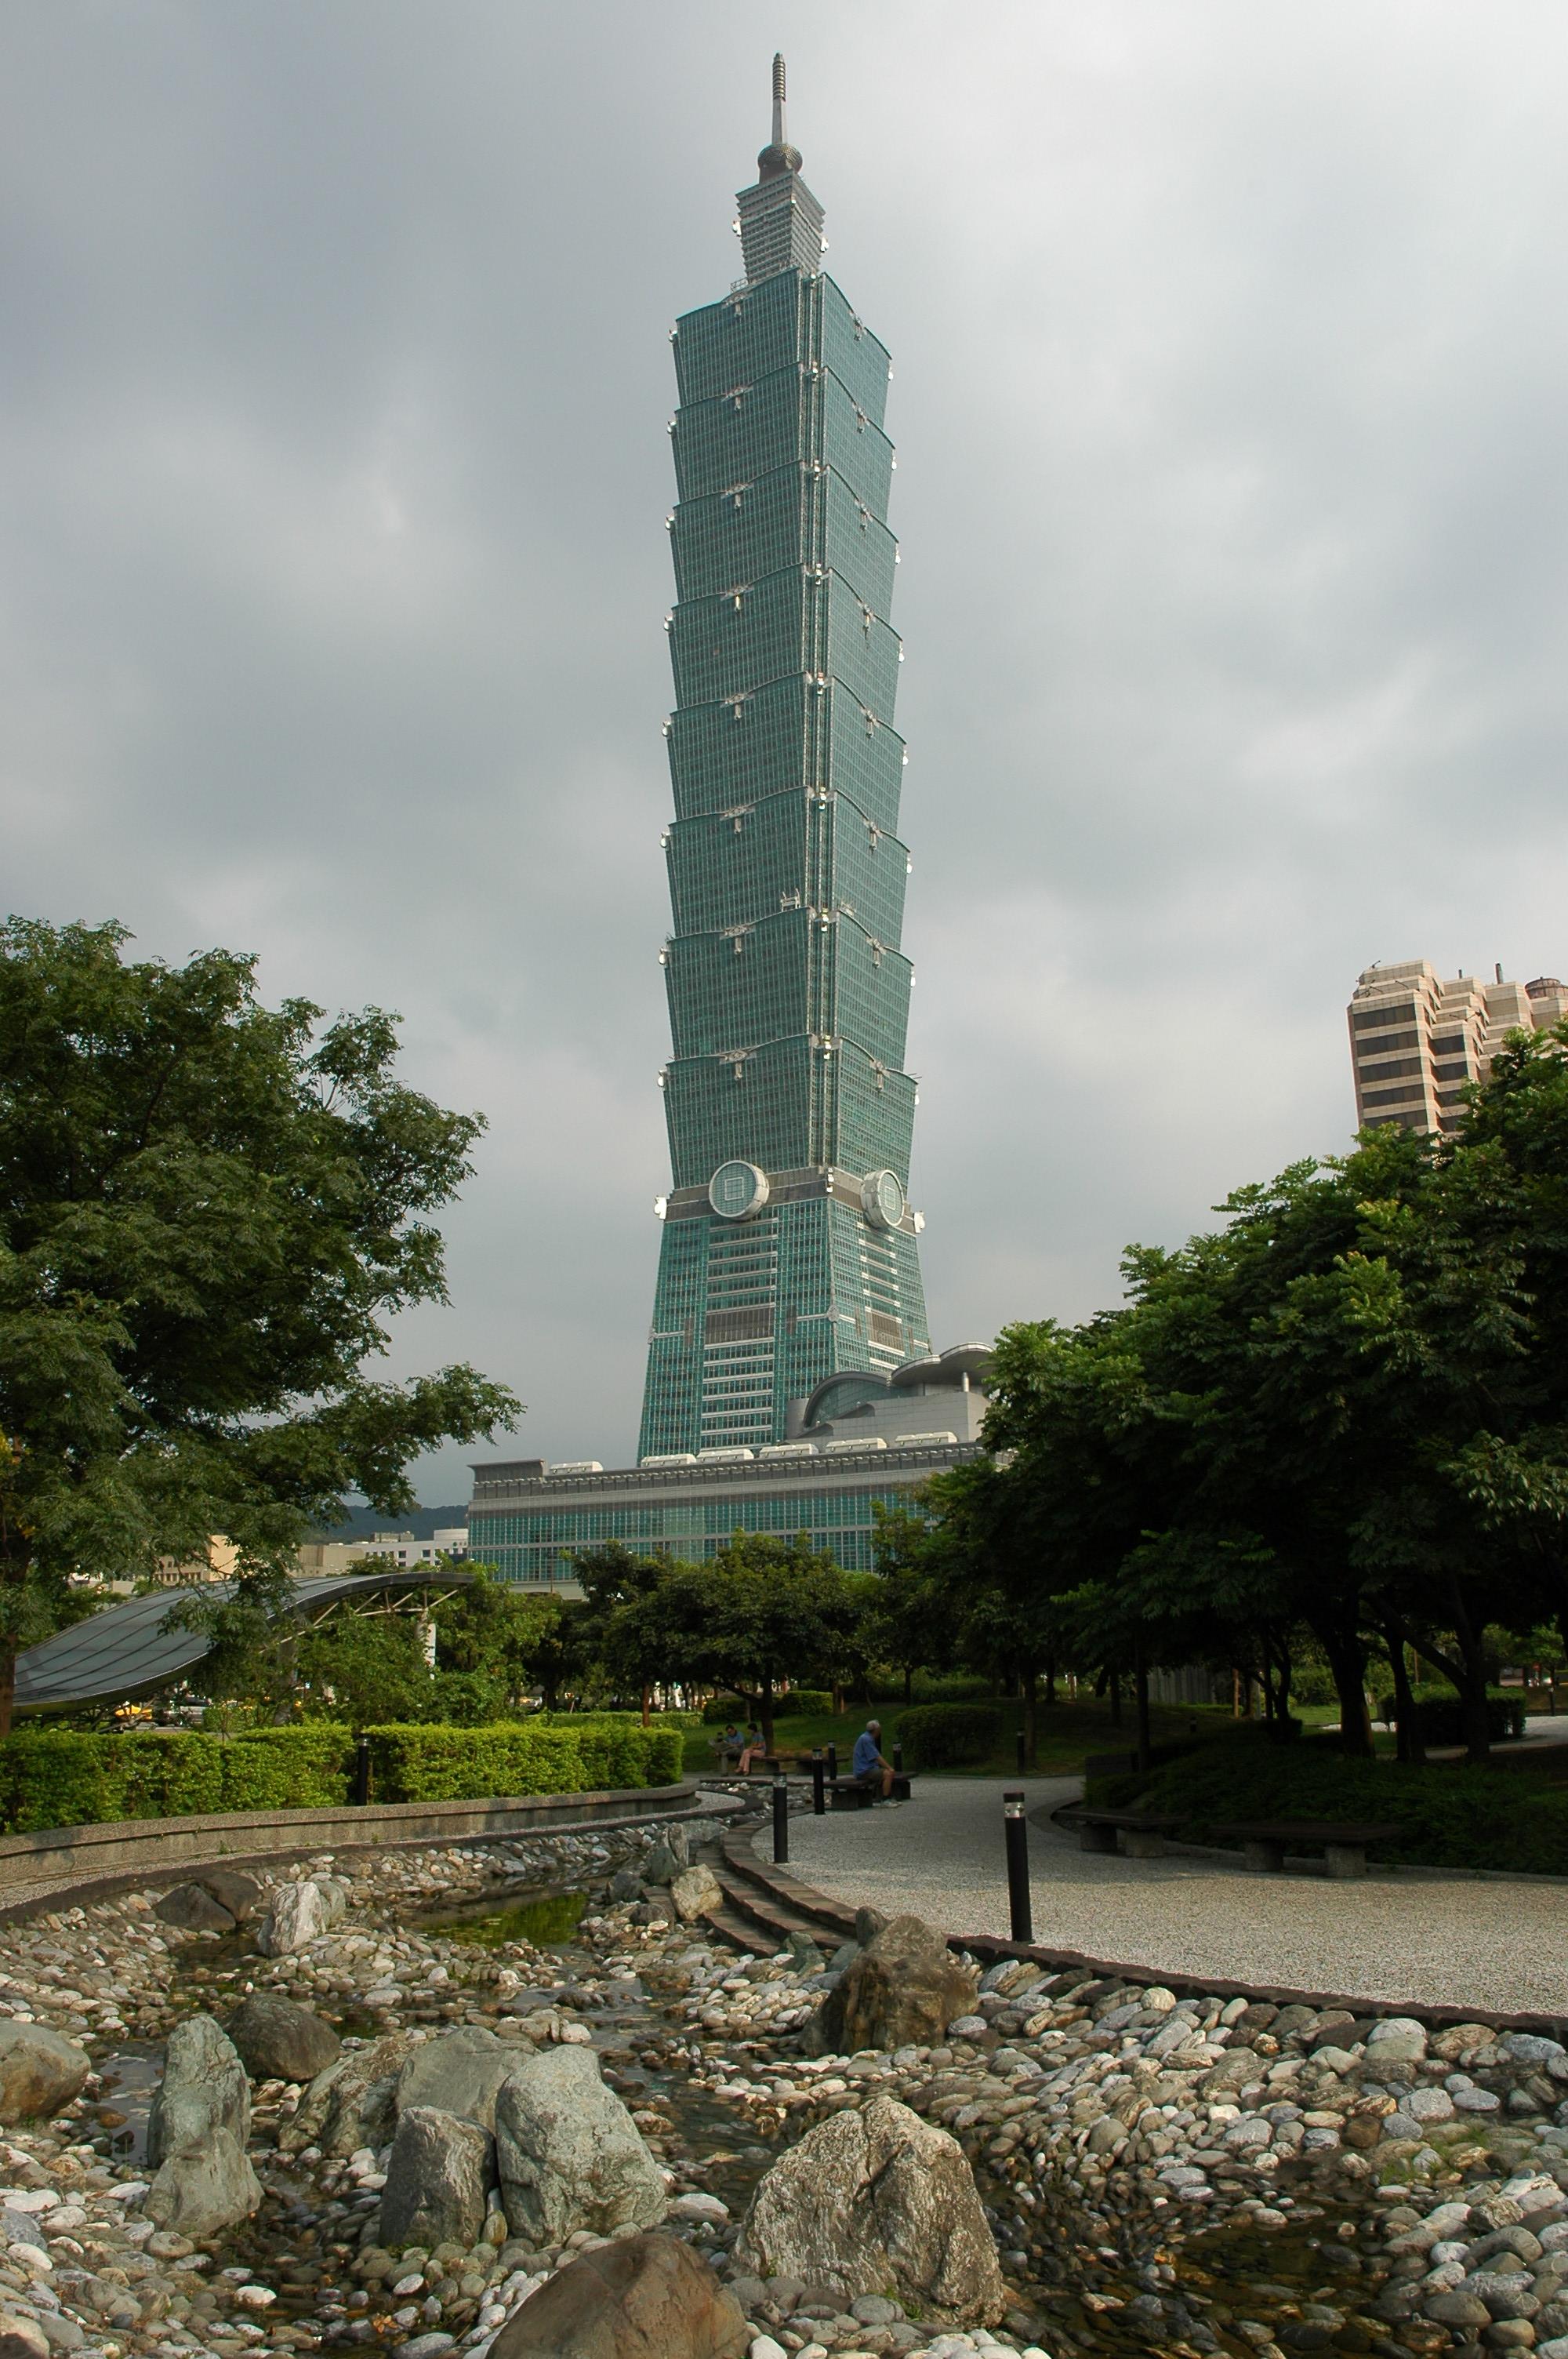 20040713 1662 Taipei 101 - Highest Buildings